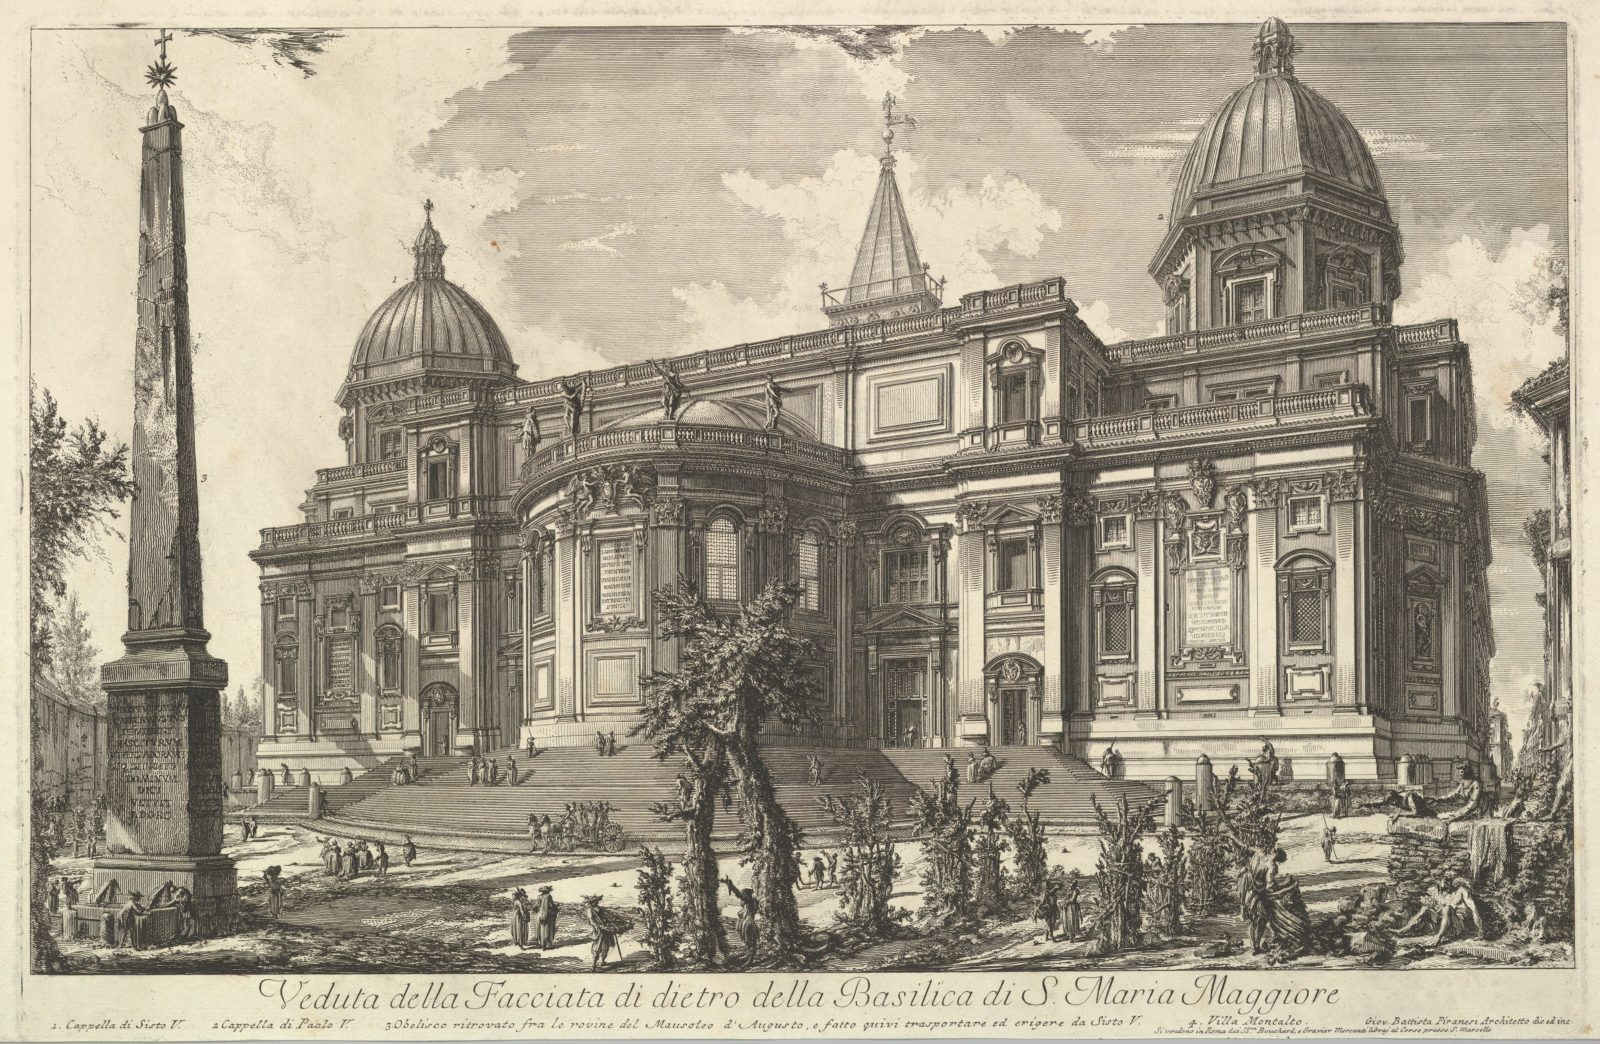 View of the rear entrance of the Basilica of S. Maria Maggiore, from Veduta di Roma (Roman Views)